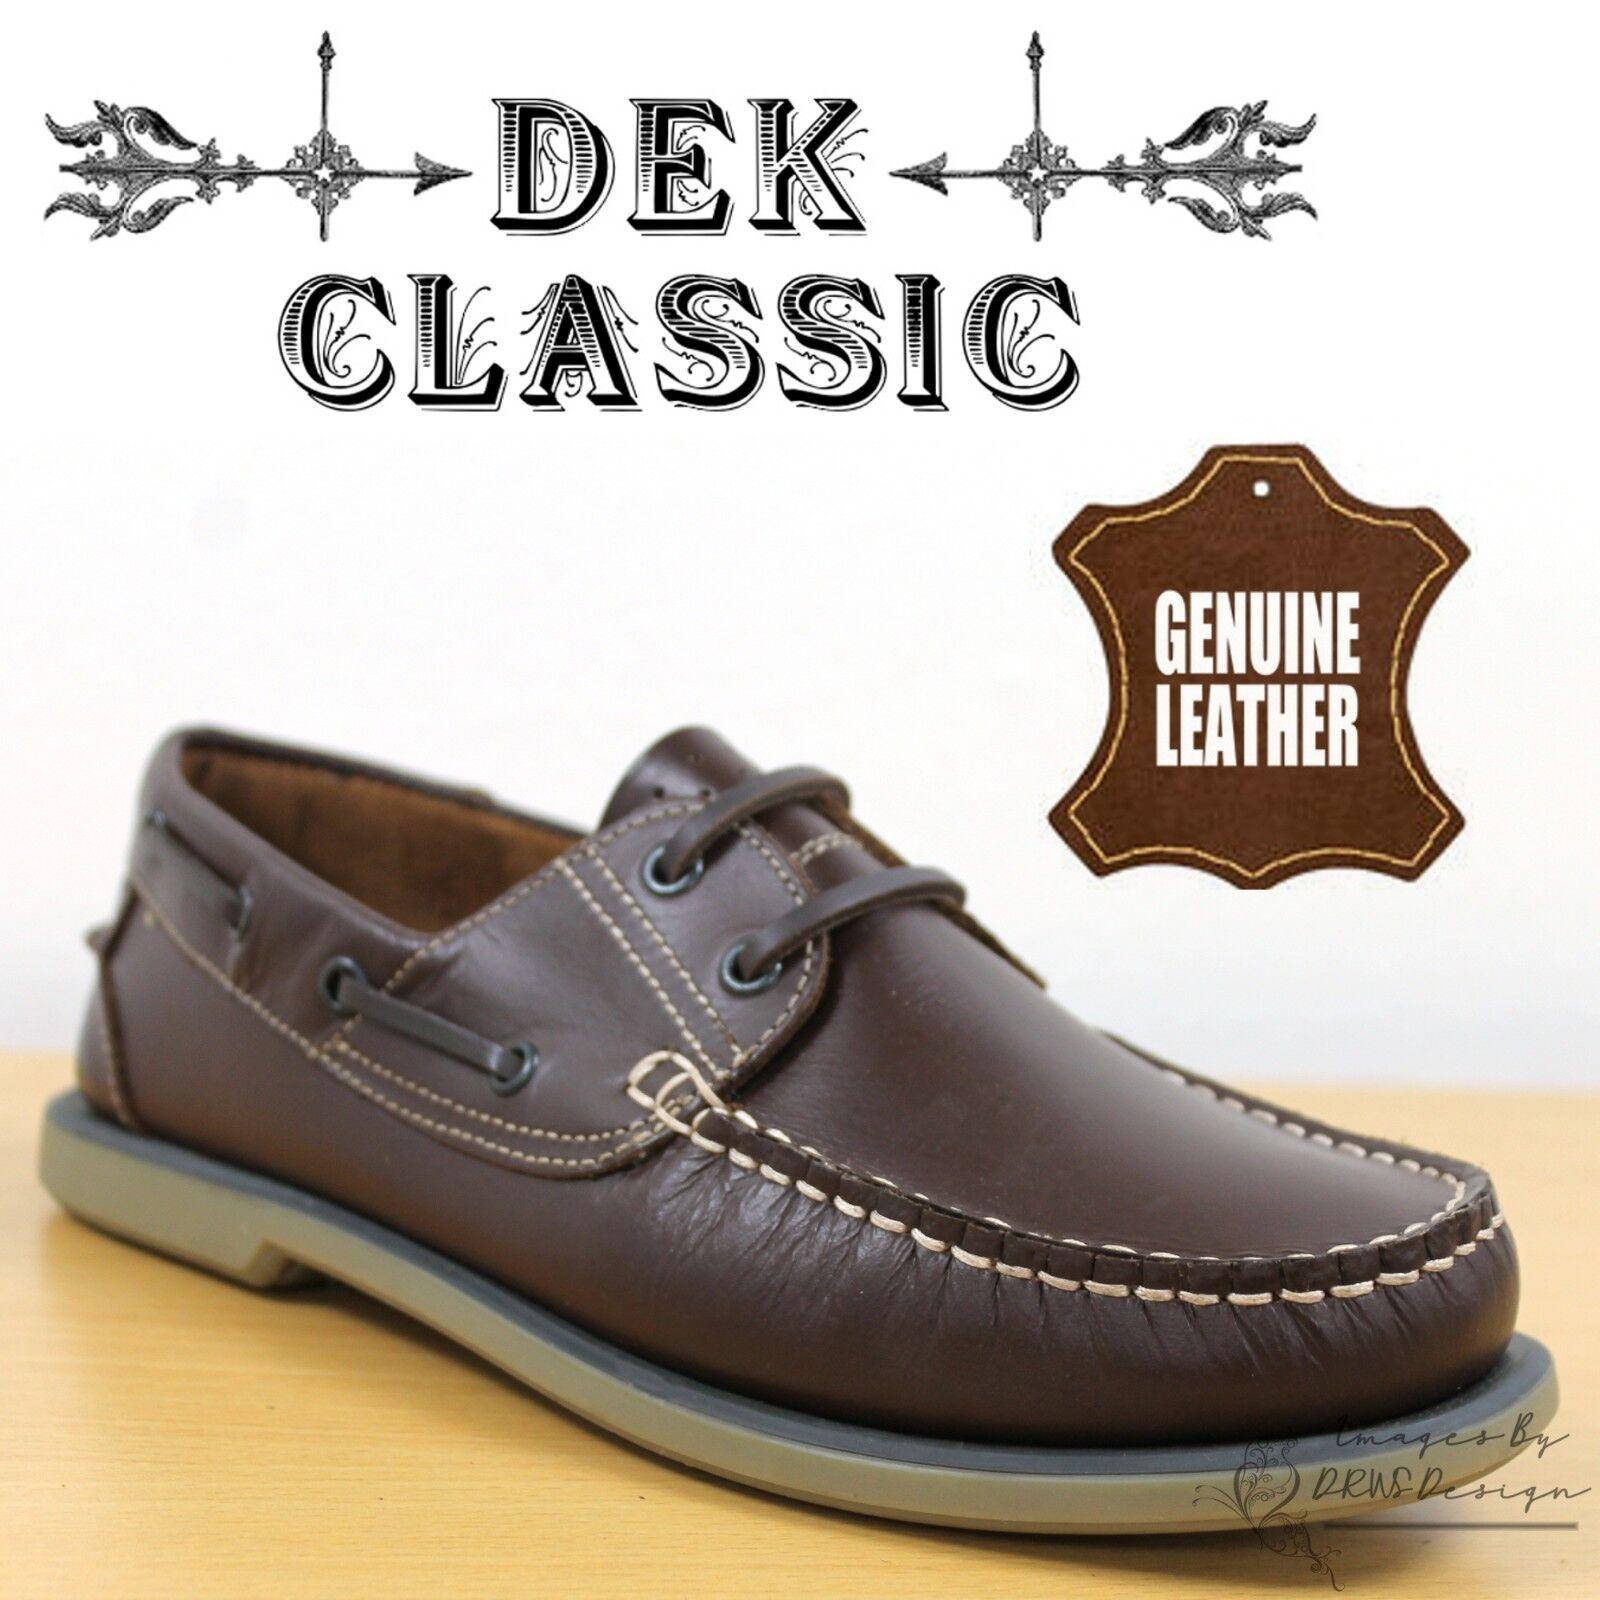 Dek Classics Men S Leather Boat Shoes Brown Smart Casual Comfort